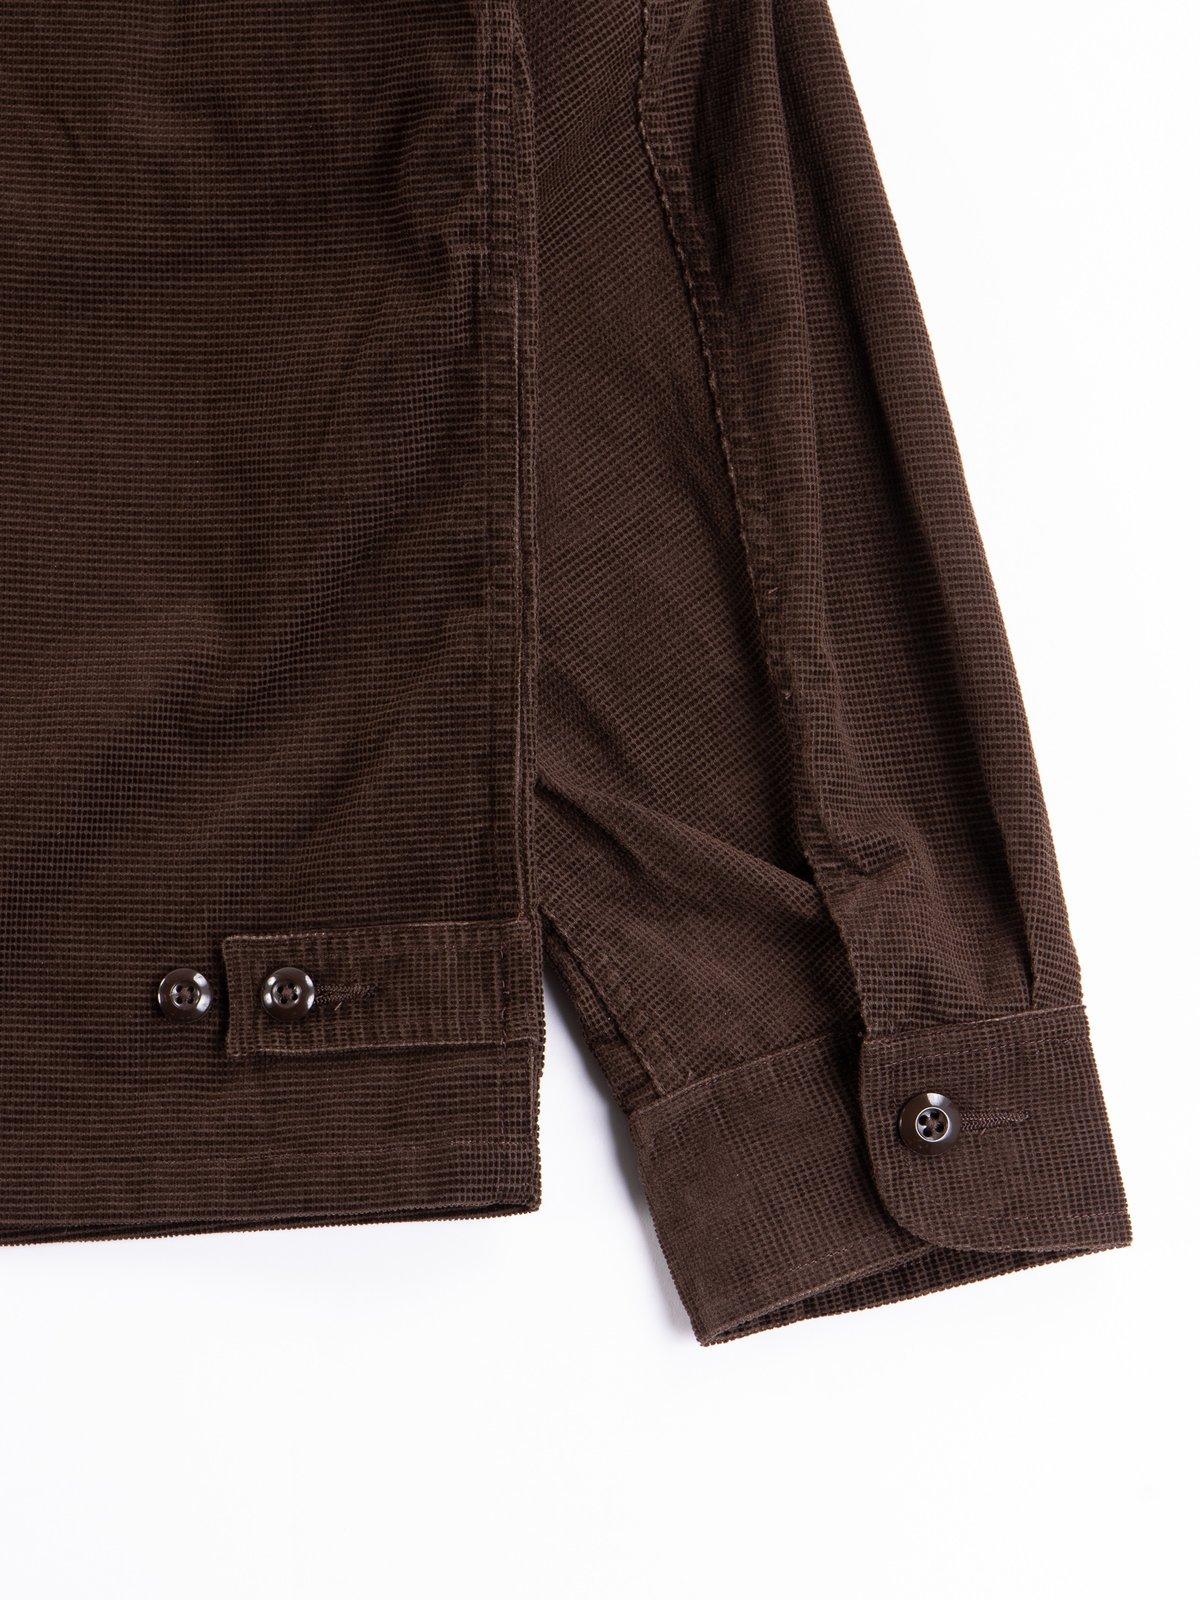 Dark Brown Dobby Caramel Corduroy Combat Short Jacket - Image 7